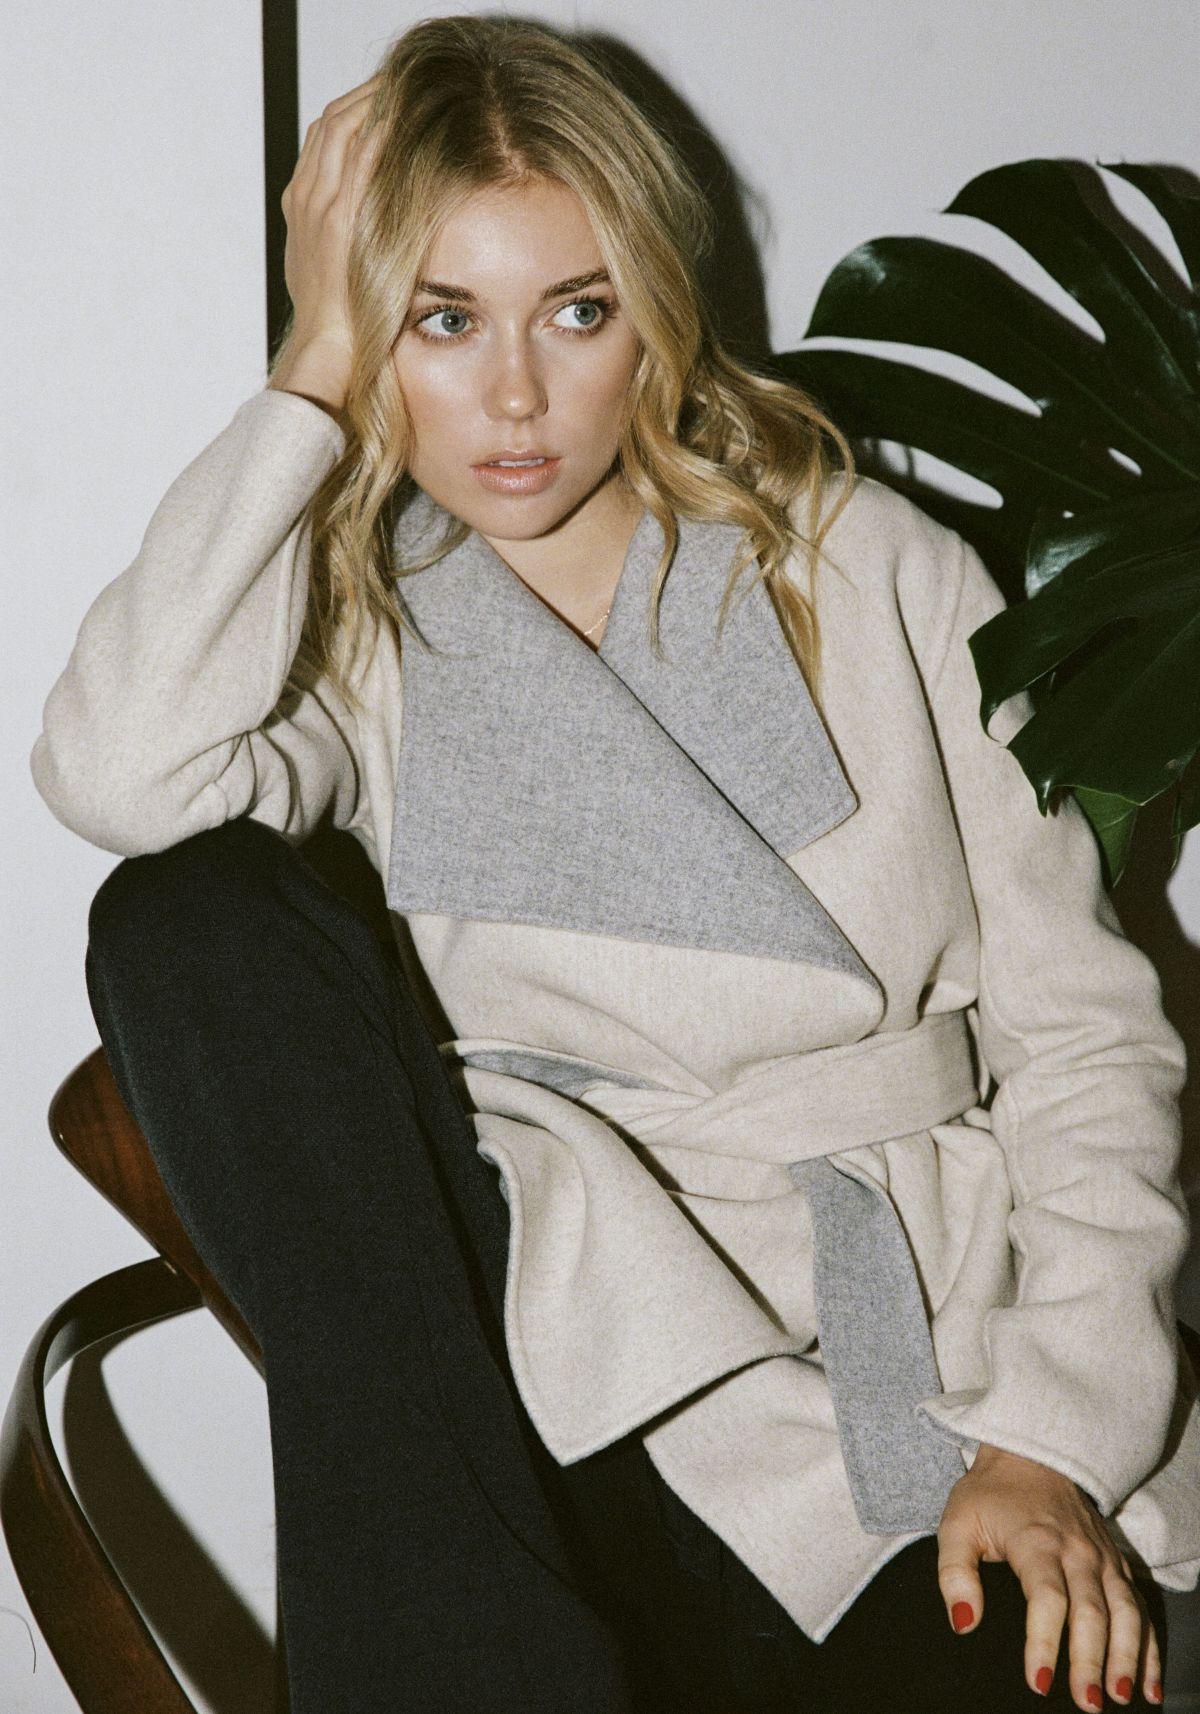 Georgia Grace Martin Fashion Model Photo Gallery - ModelsIntro